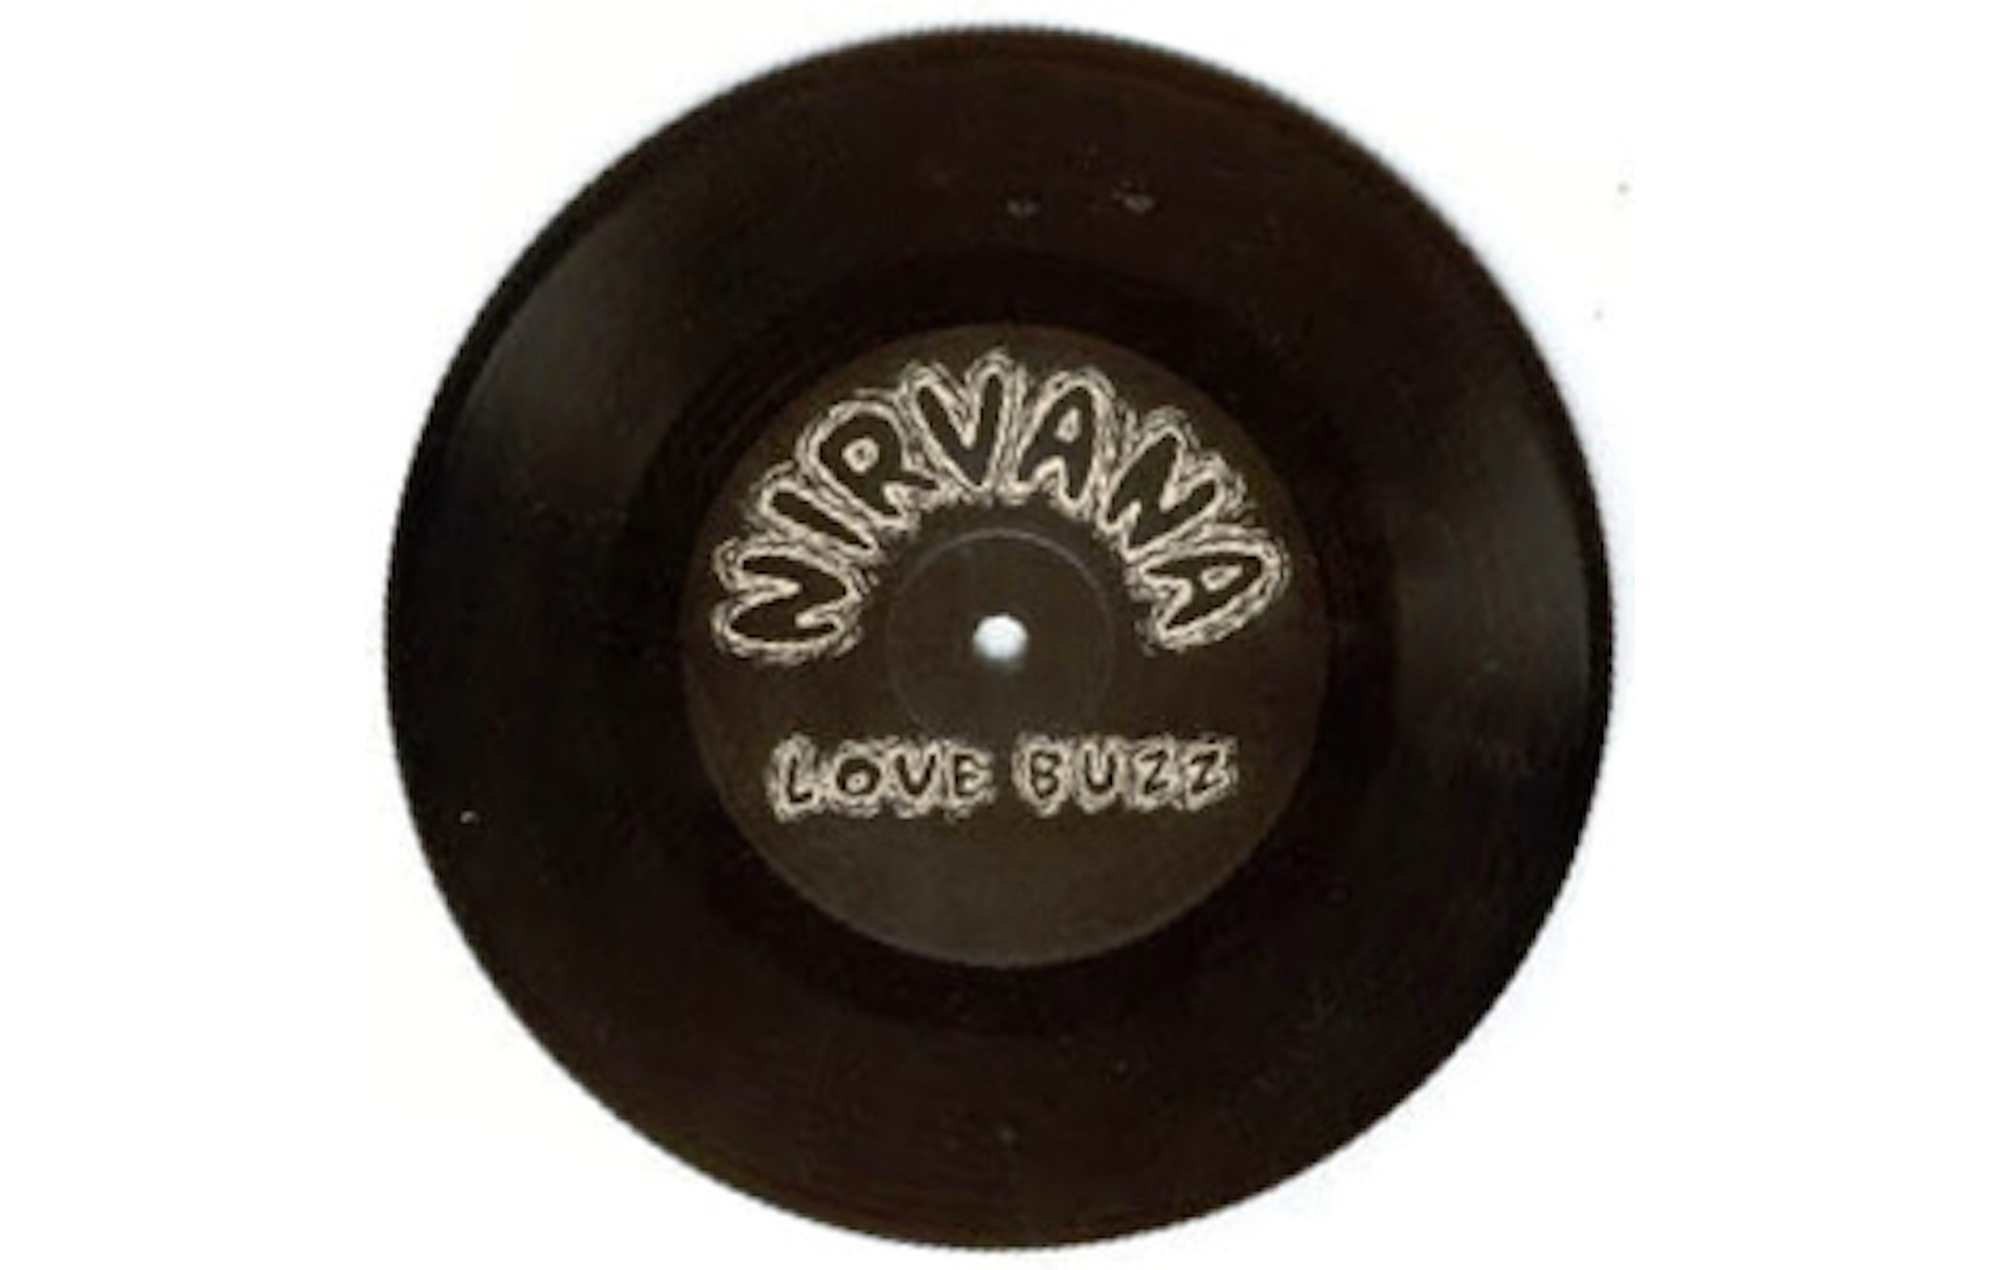 Nirvana Love Buzz 7-inch